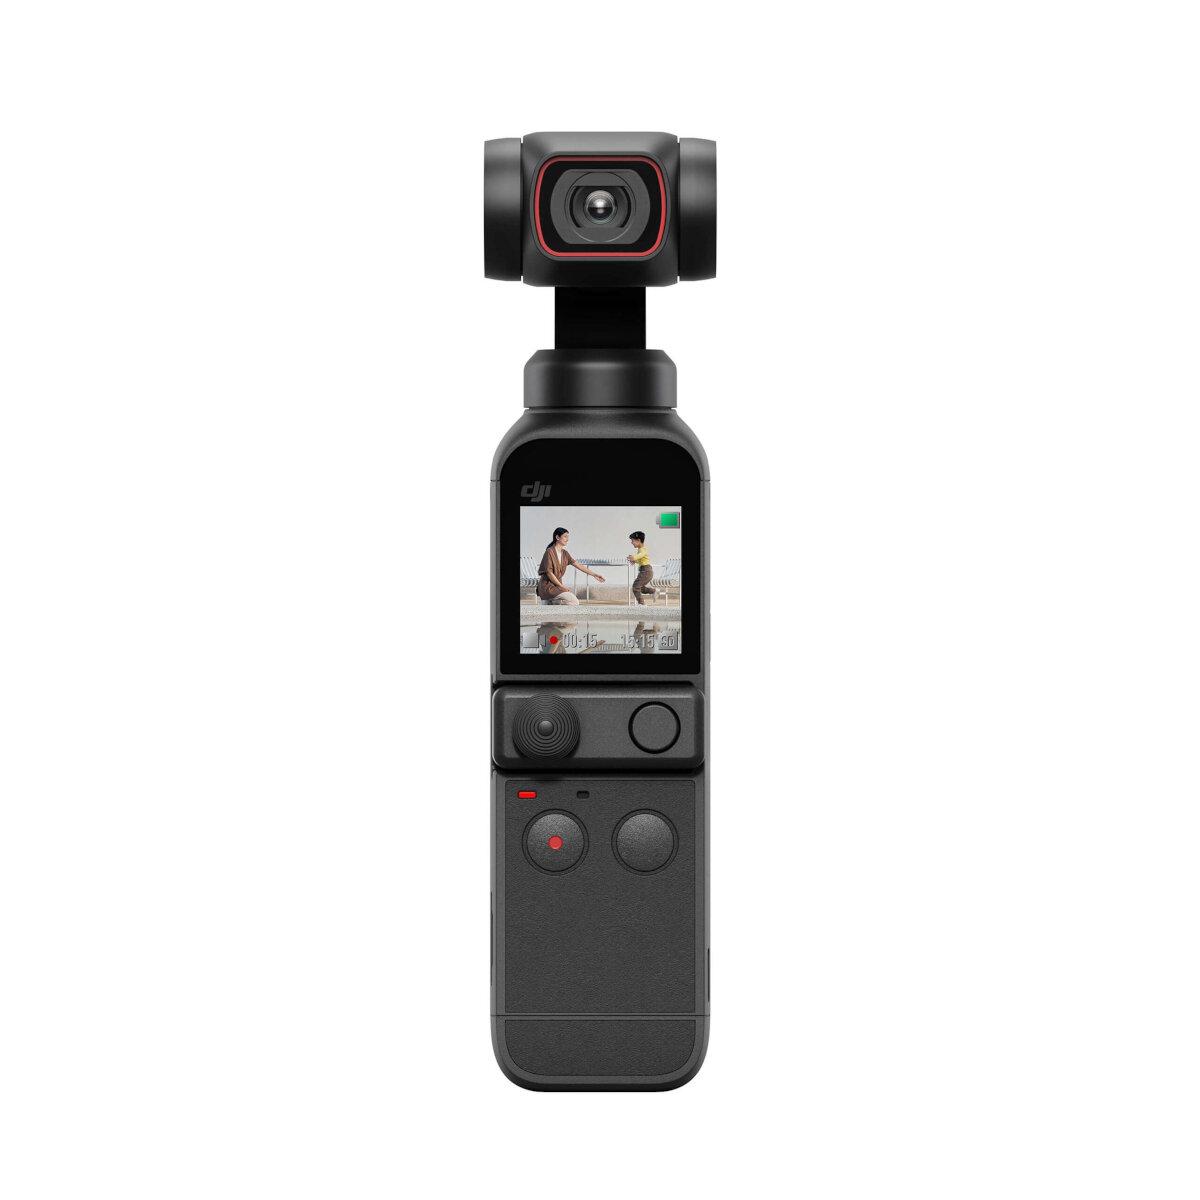 DJI OSMO POCKET 2 FPV Gimbal 3-Axis Handheld Stabilizer FOV 93 Degree Camera 64MP AI Editor Stereo 4K HD 60fps Recording